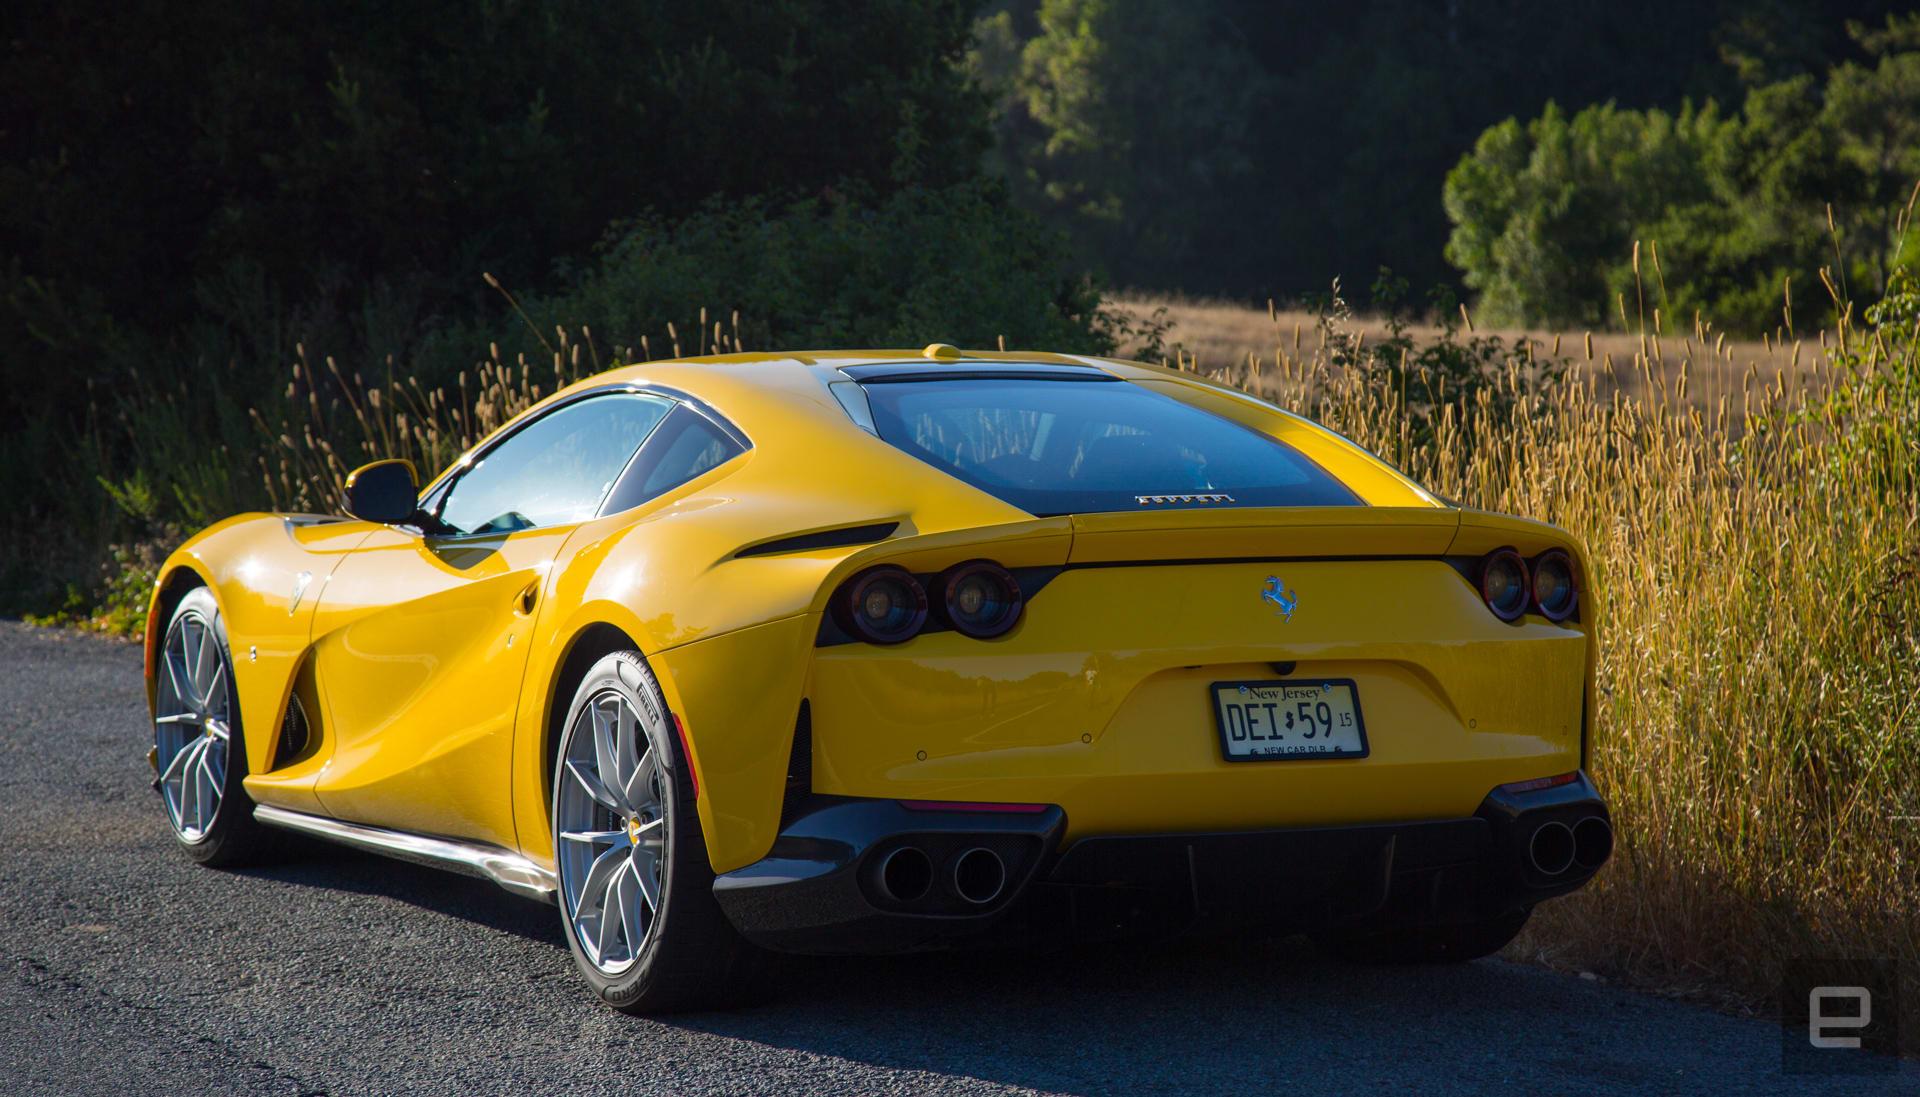 Ferrari 812 Superfast review